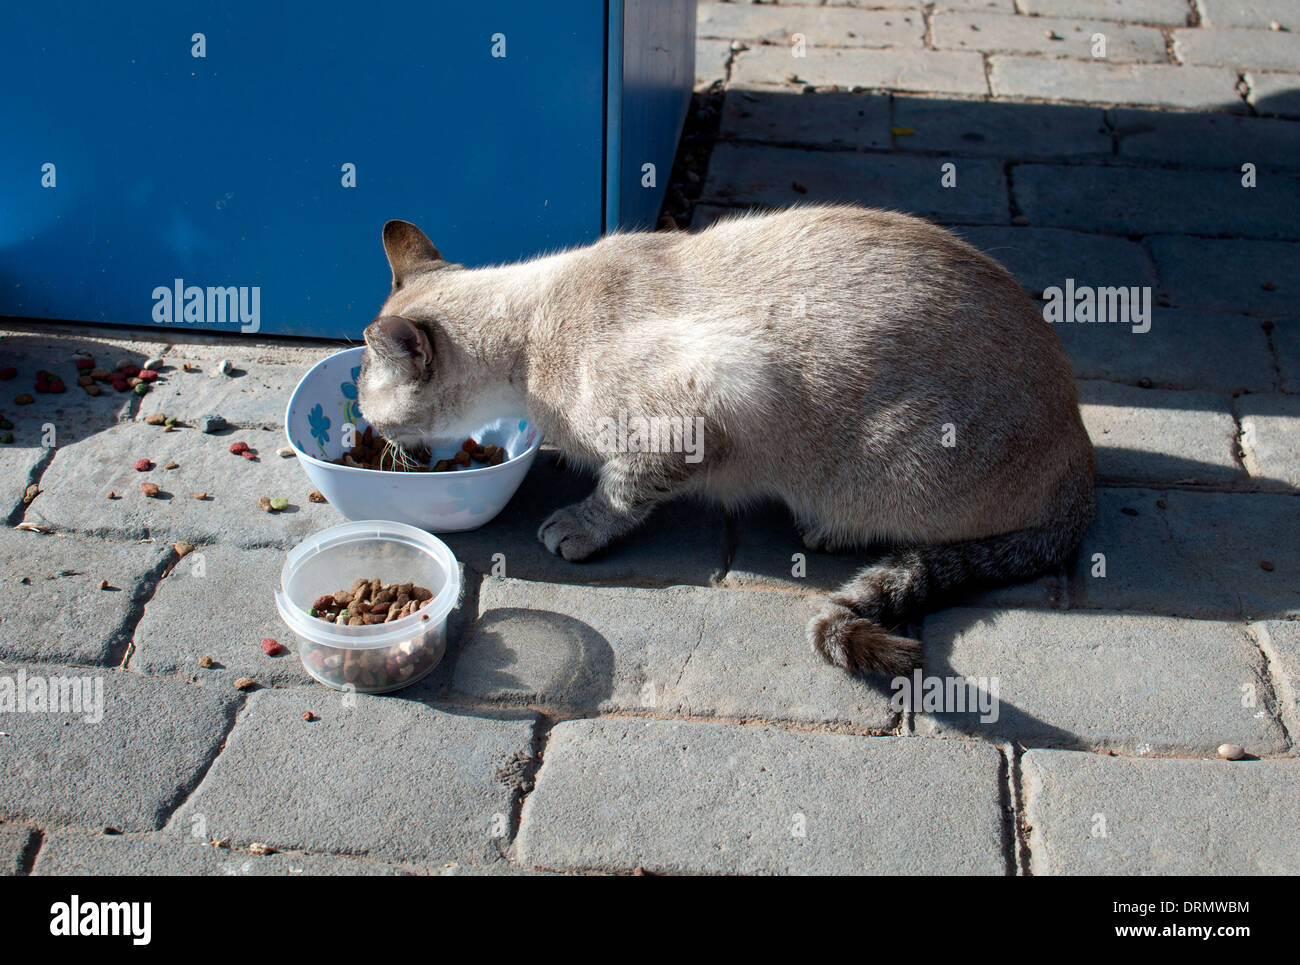 Streunende Katze essen löschte, Caleta de Fuste, Fuerteventura, Kanarische Inseln, Spanien. Stockbild